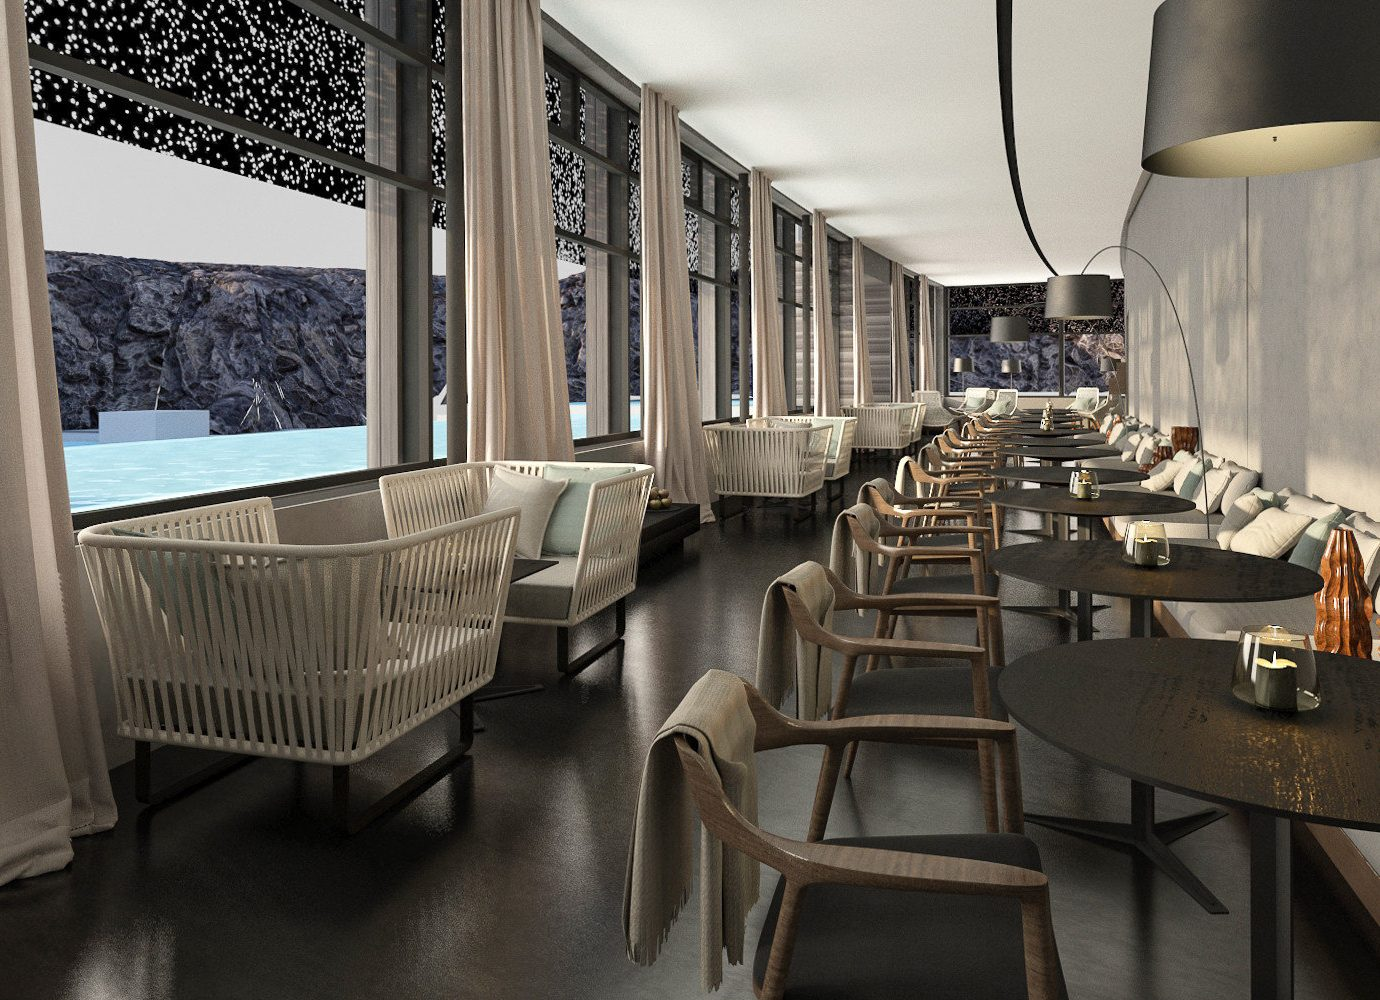 Hotels Iceland interior design restaurant furniture